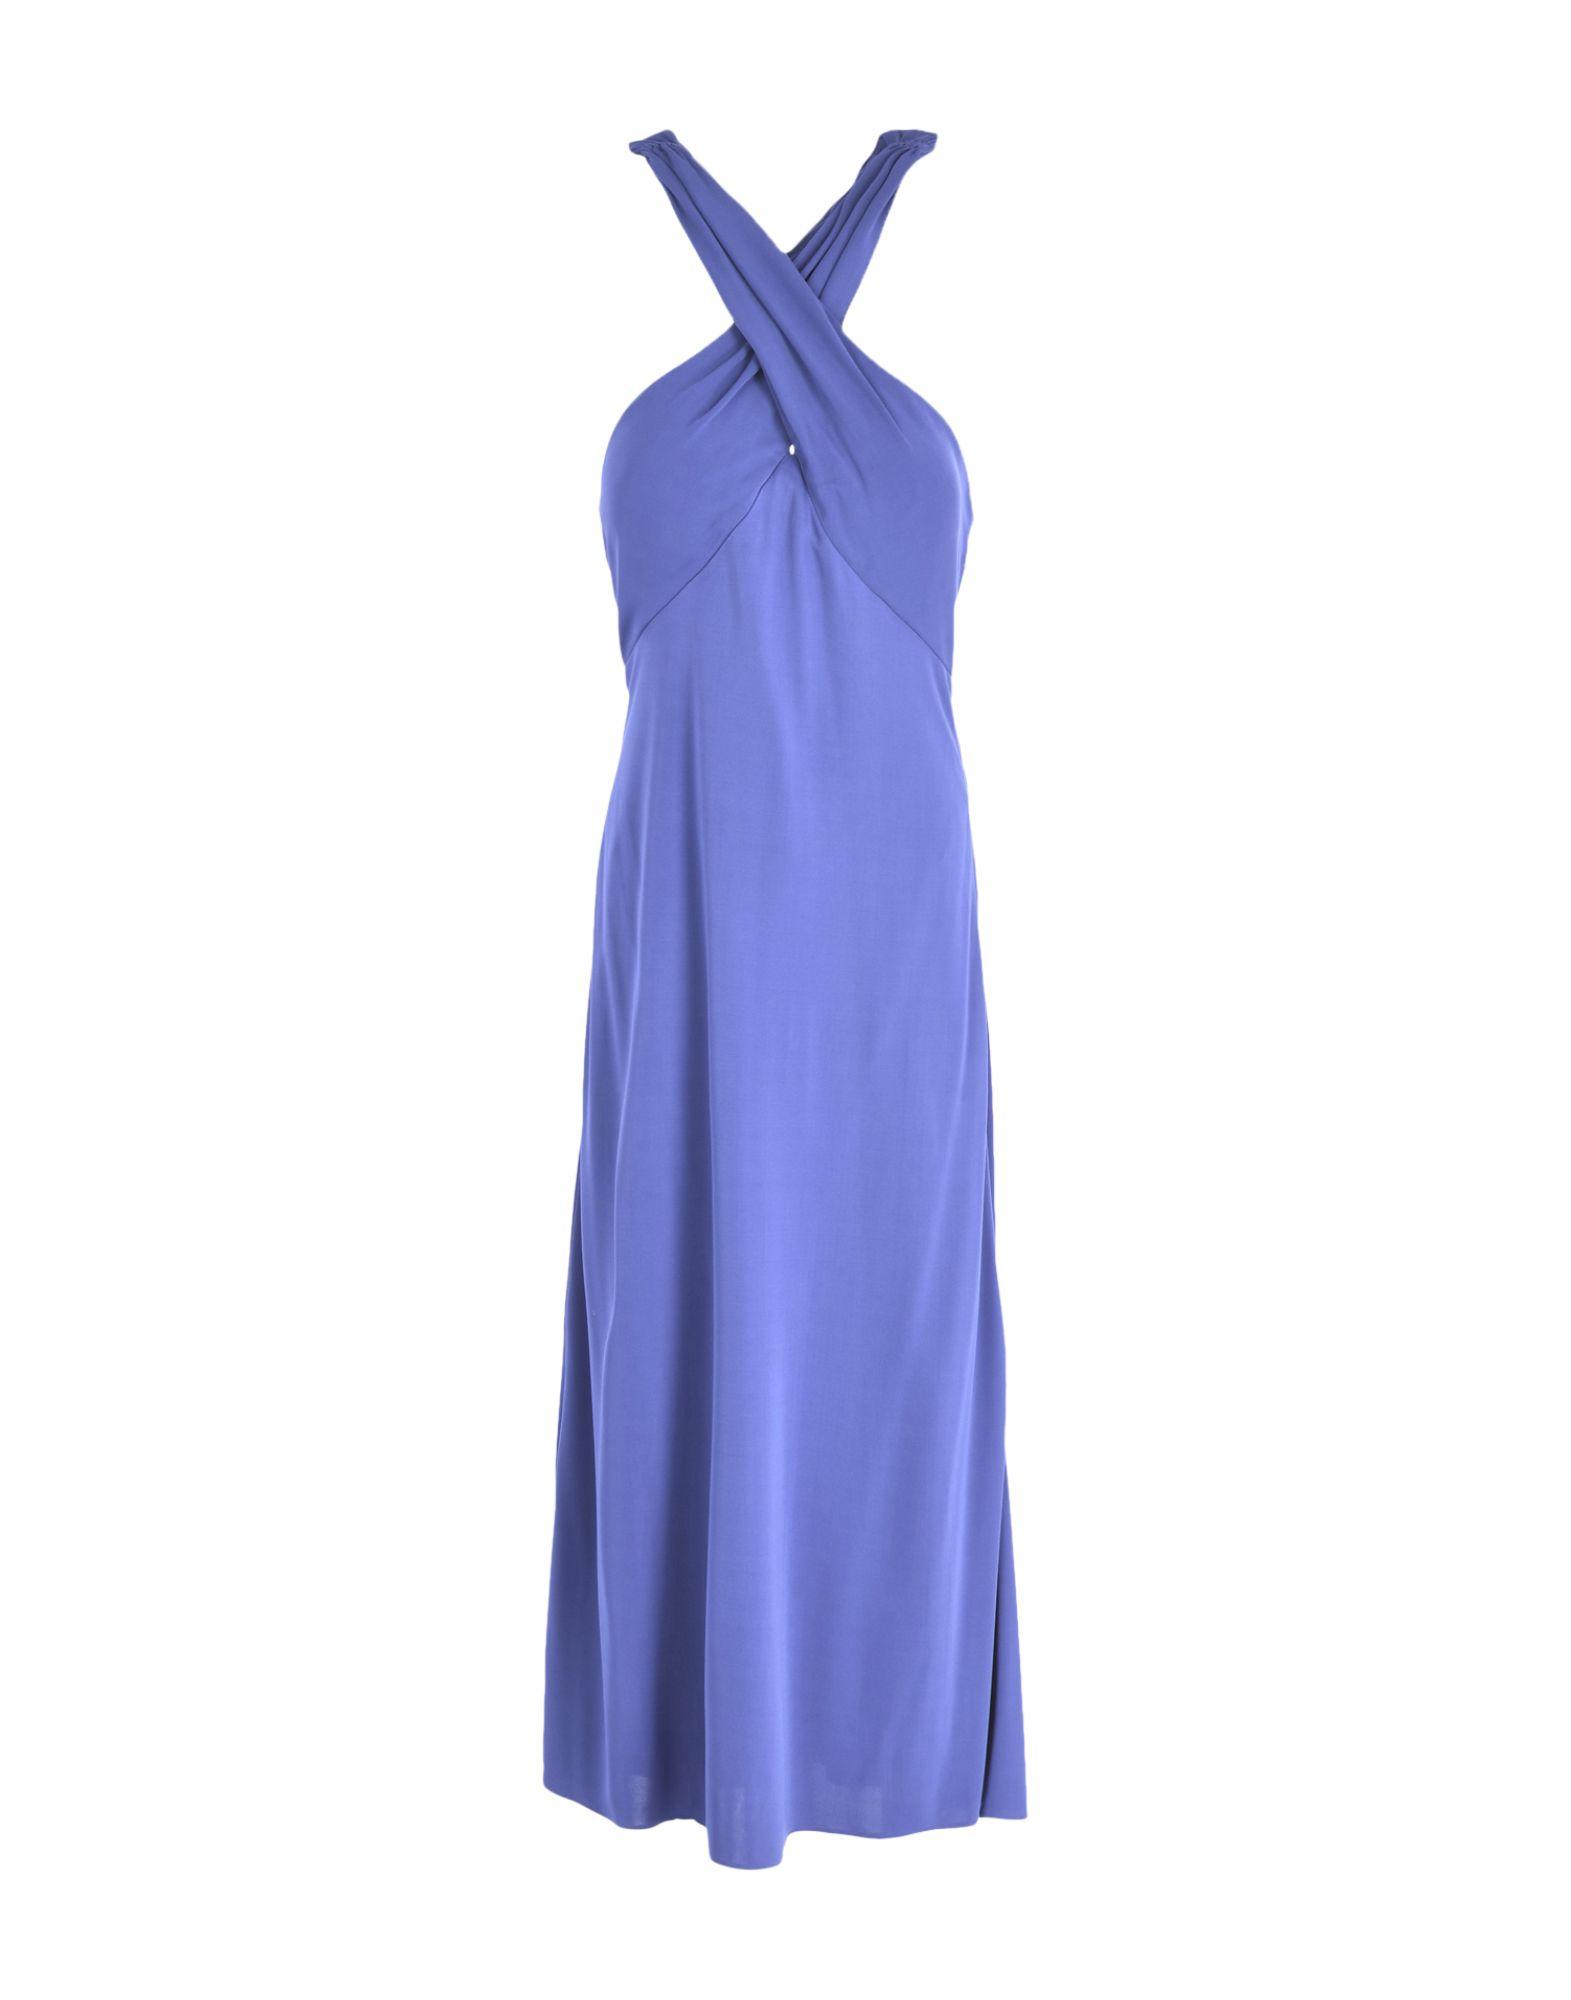 GAI MATTIOLO Платье длиной 3/4 gai mattiolo couture юбка длиной 3 4